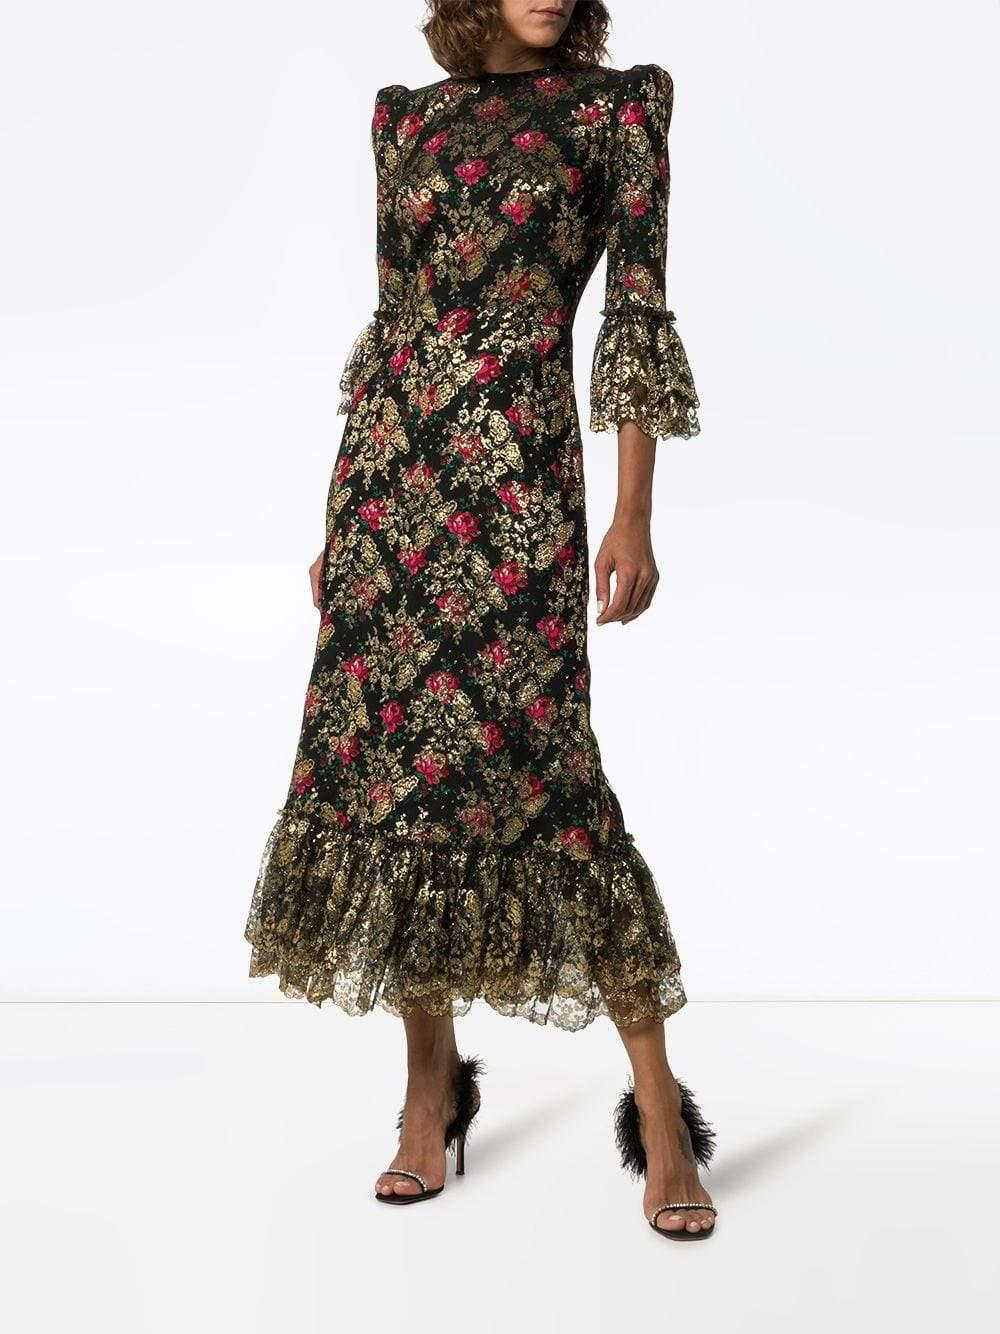 THE VAMPIRES WIFE Wild Rose Floral Midi Dress